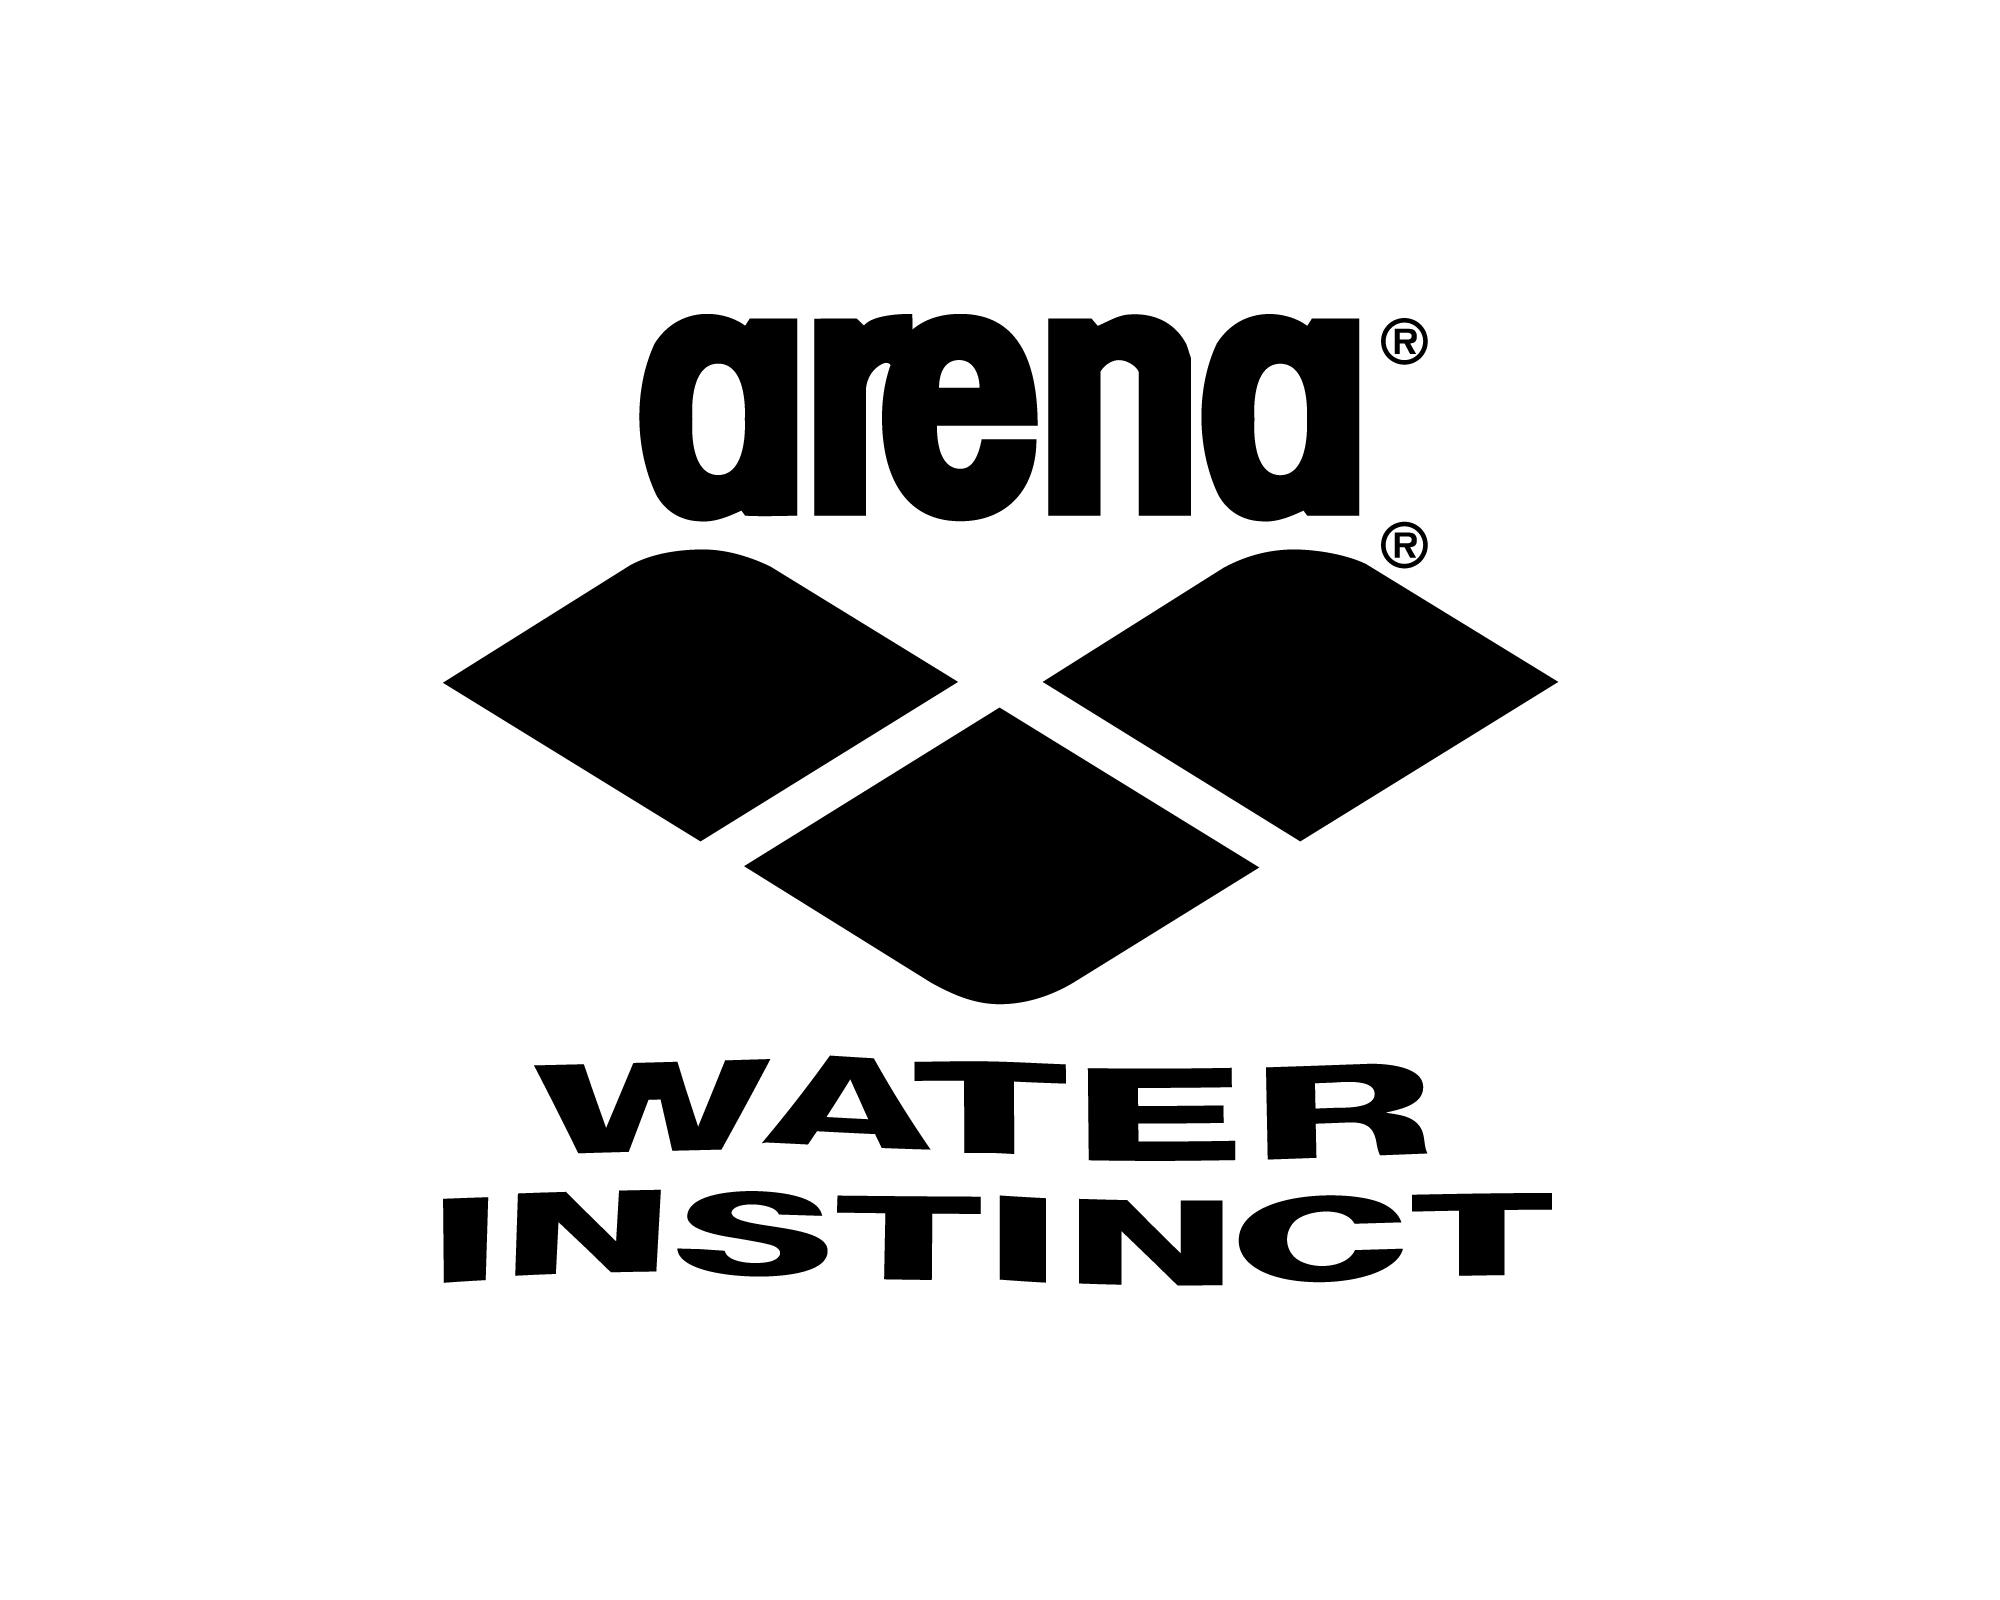 Arena Logo And Slogan Water Instinct   Arena Logo Png - Arena Jov Vector, Transparent background PNG HD thumbnail